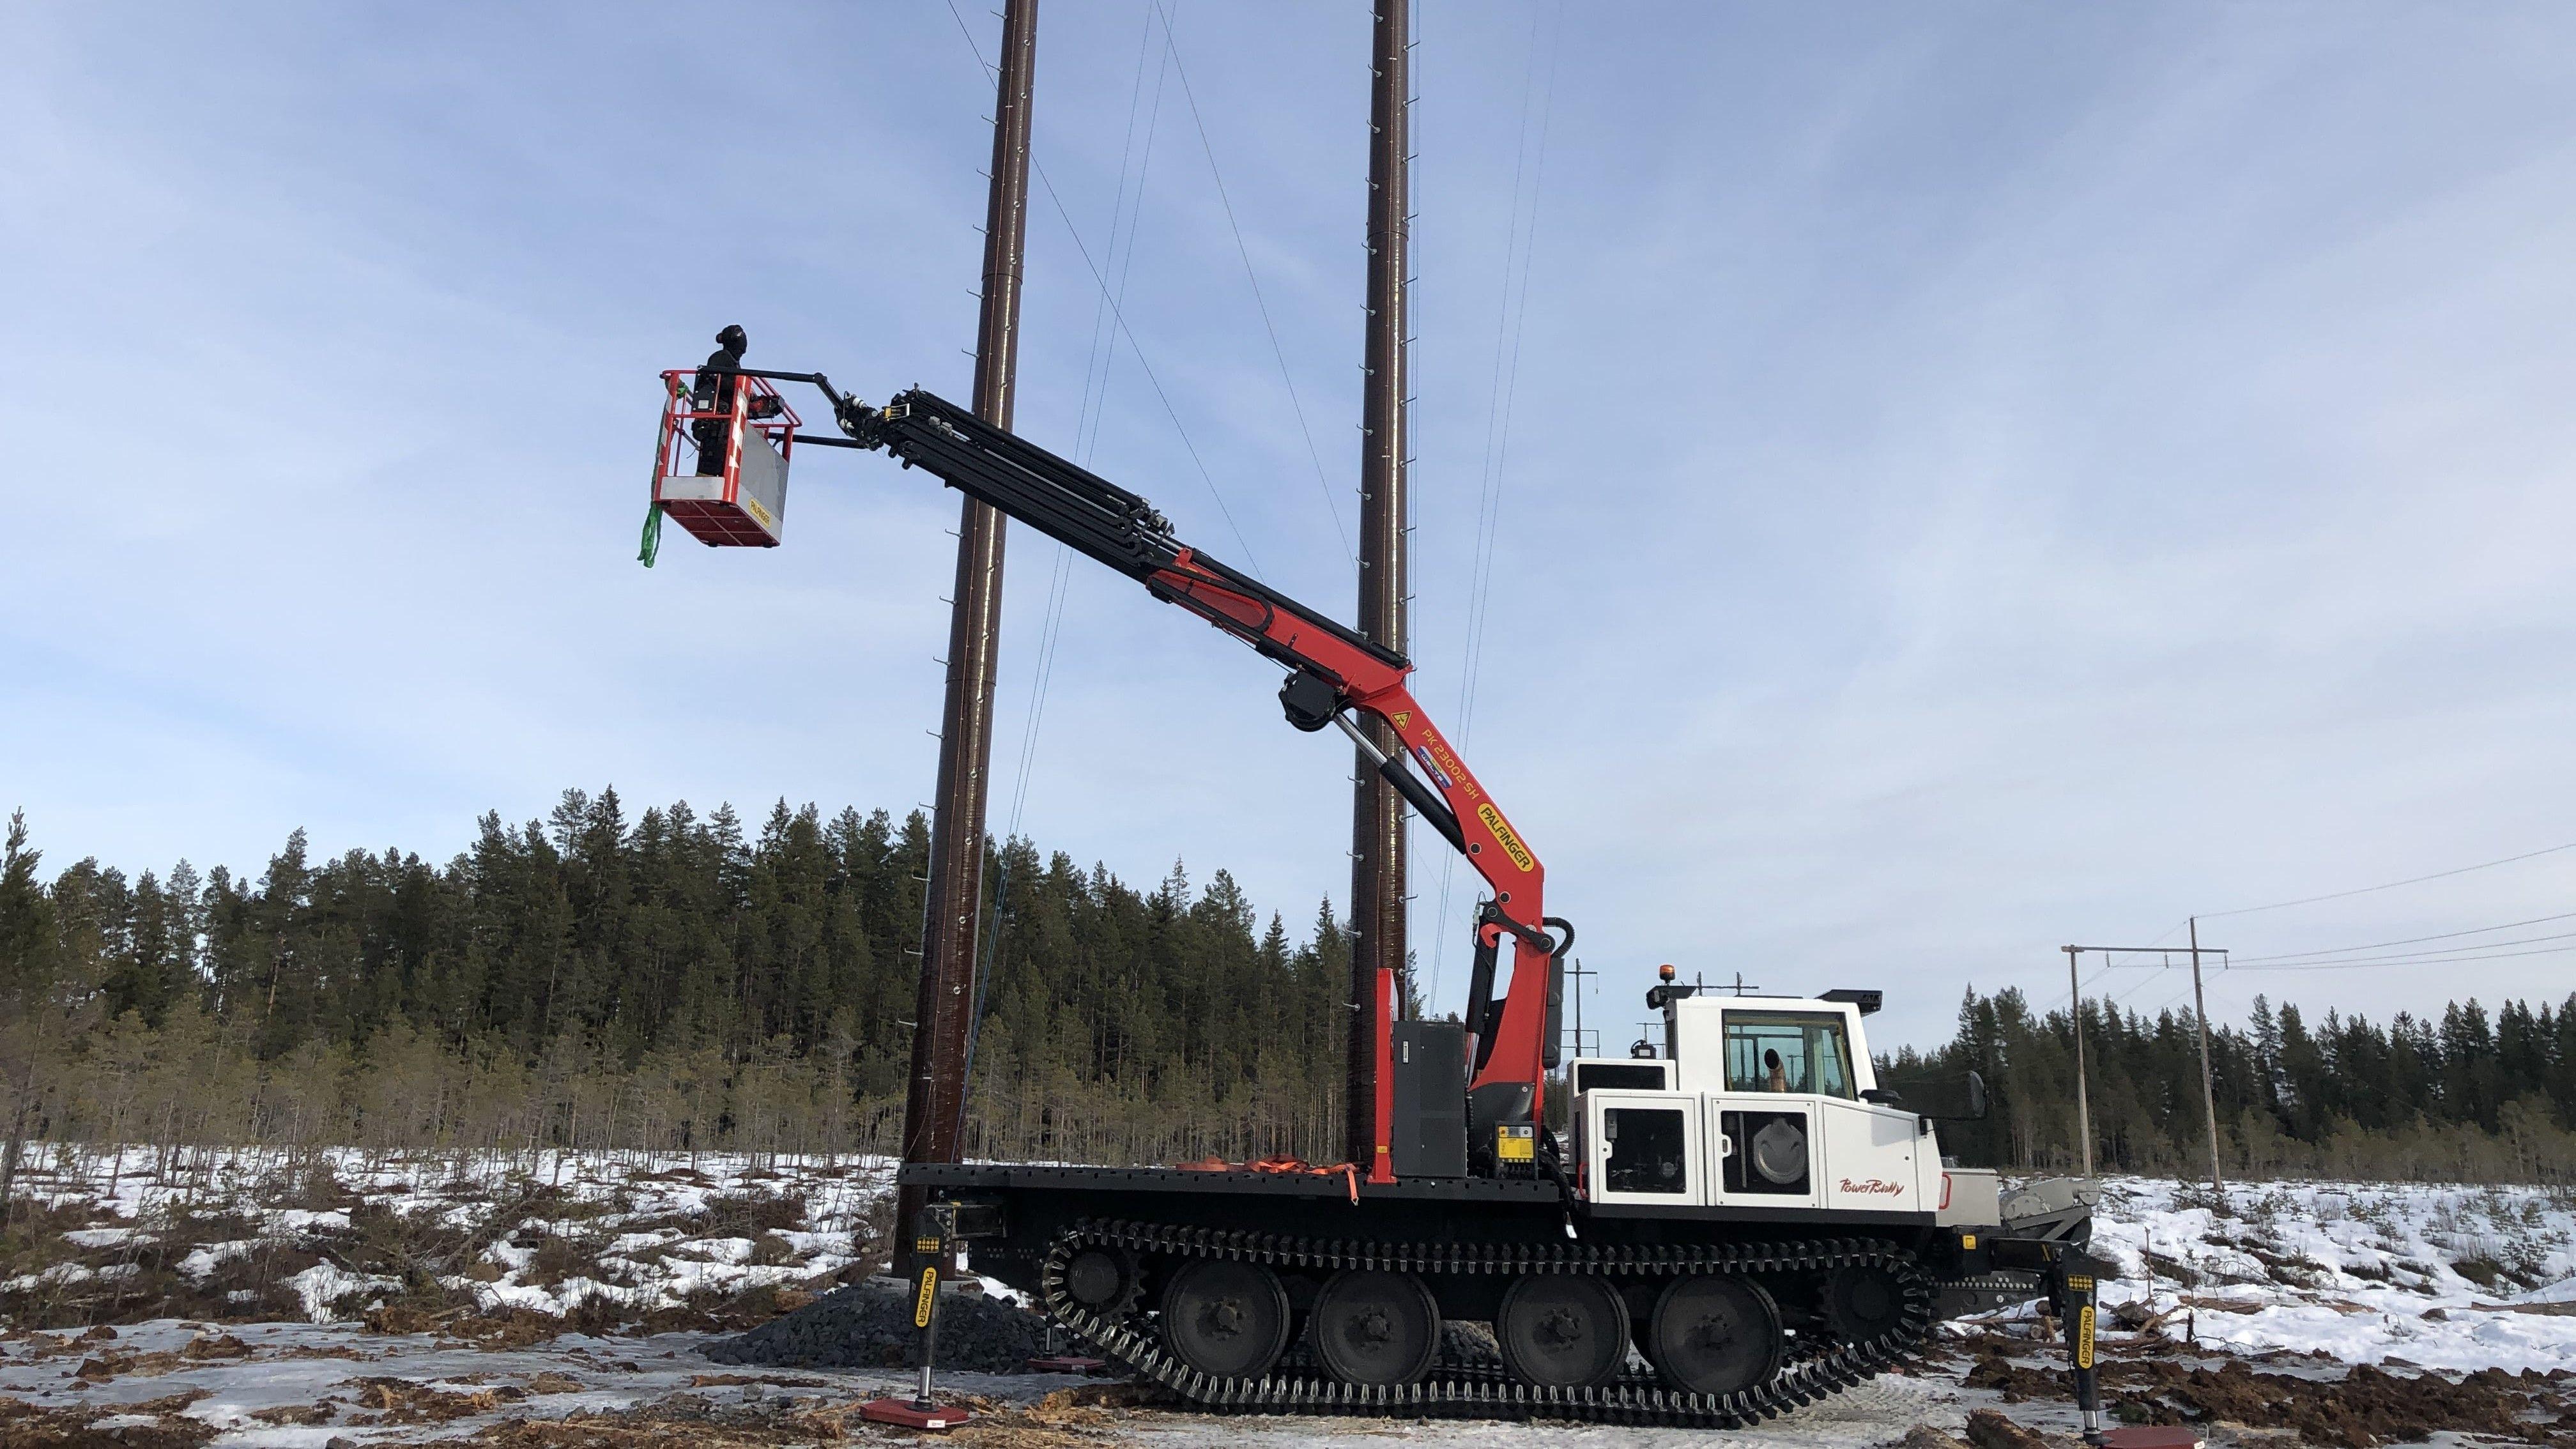 PowerBUlly Geräteträger: Einsatz an Stromtrassen